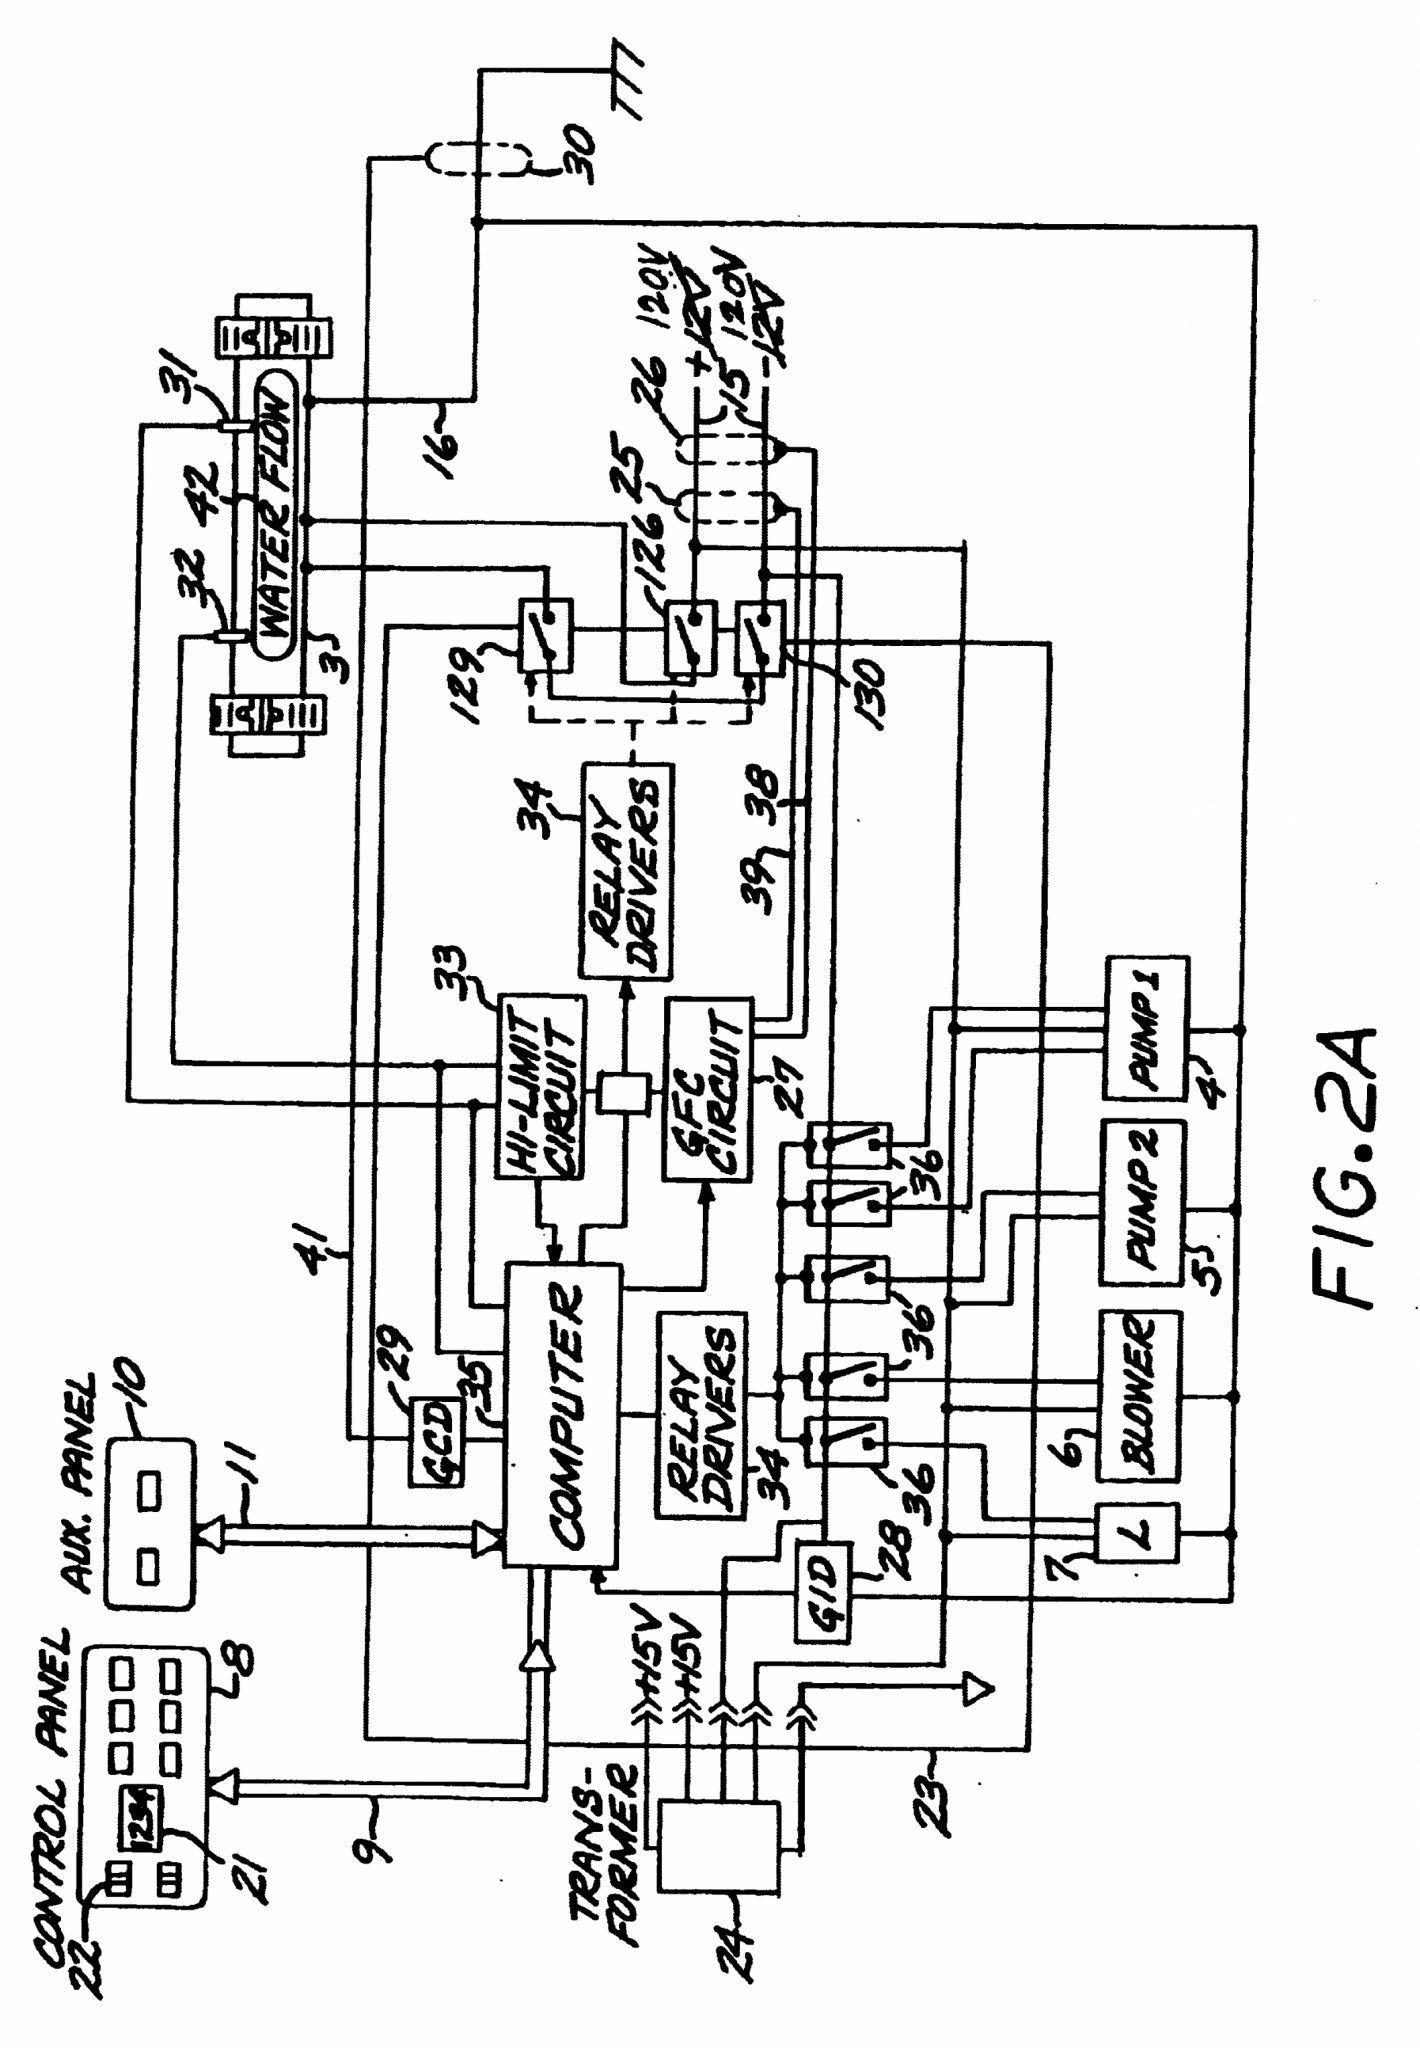 Well Pump Pressure Switch Wiring Diagram Square D Well Pump Pressure Switch Wiring Diagram Of Well Pump Pressure Switch Wiring Diagram